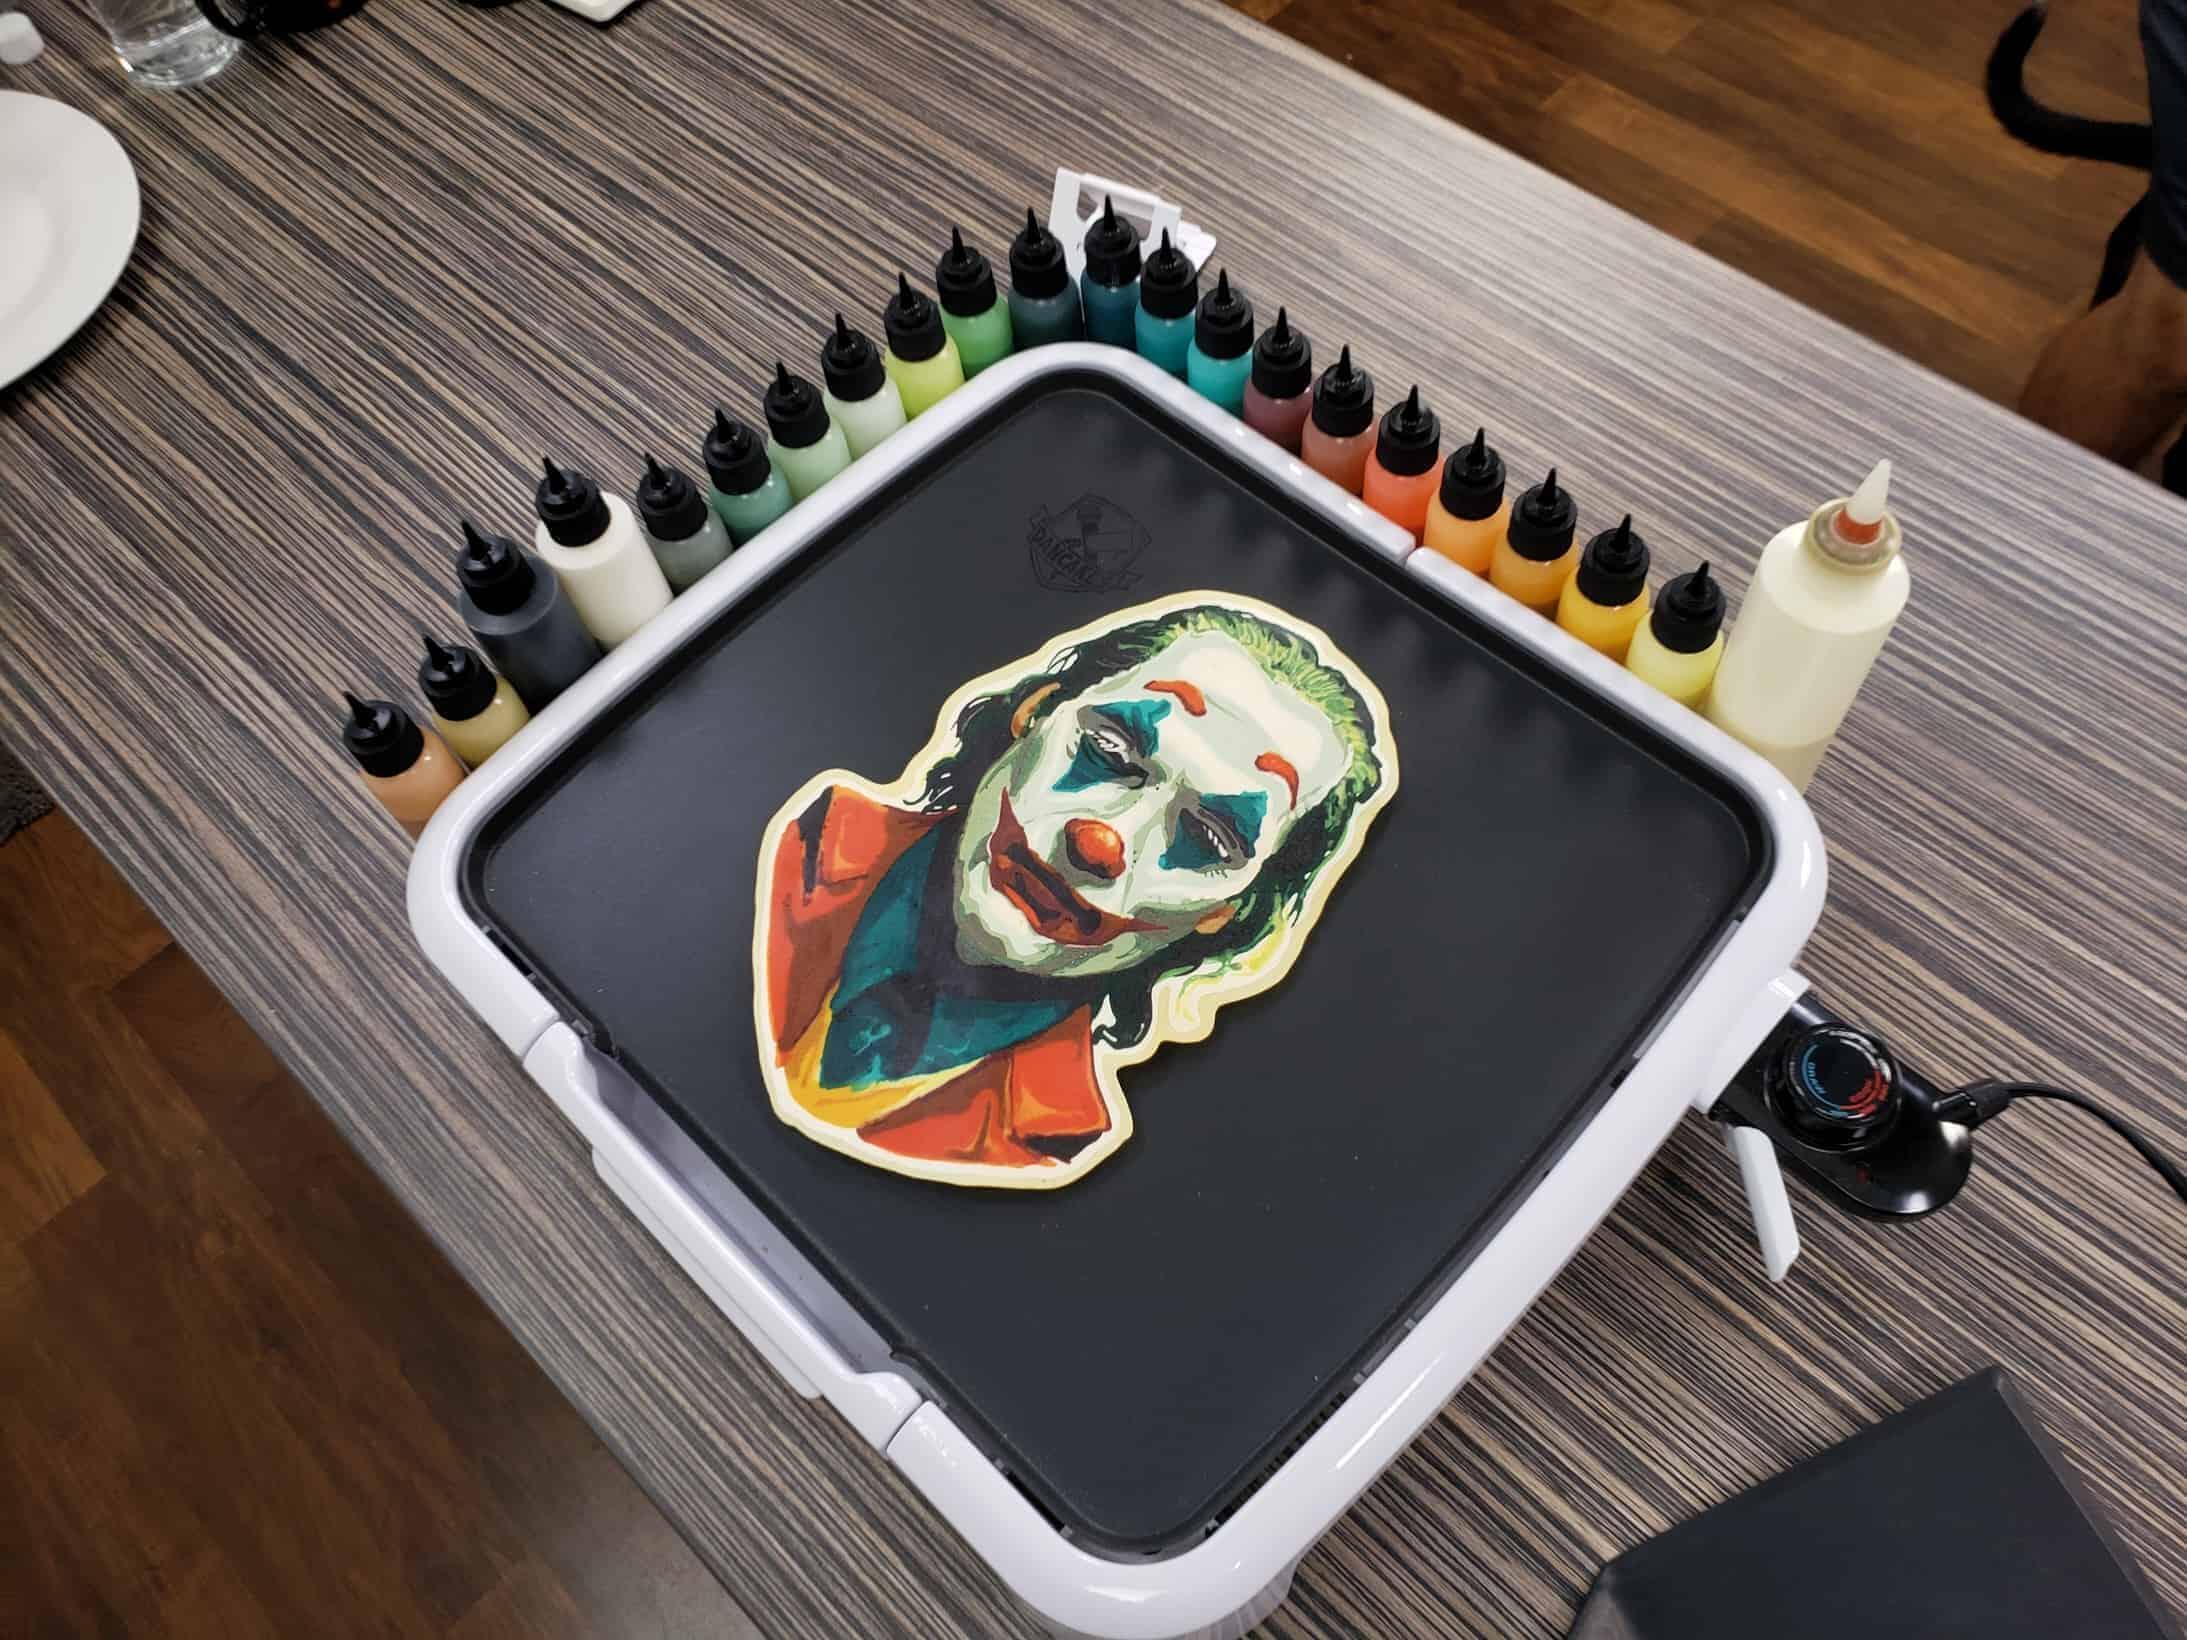 Joaquin Phoenix - Joker Pancake Art